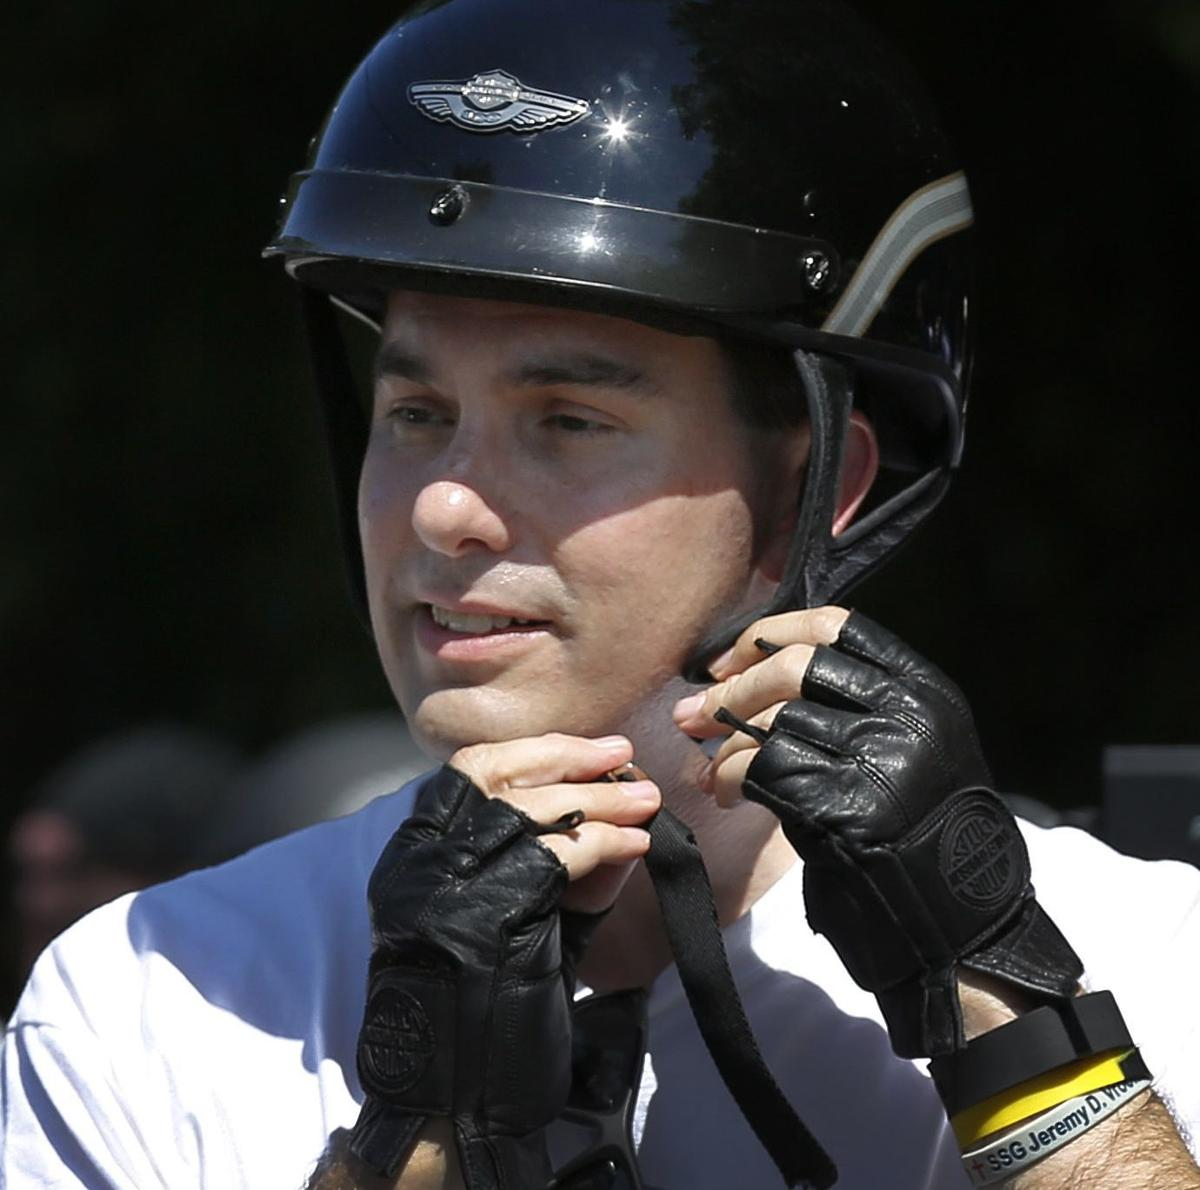 Walker in helmet